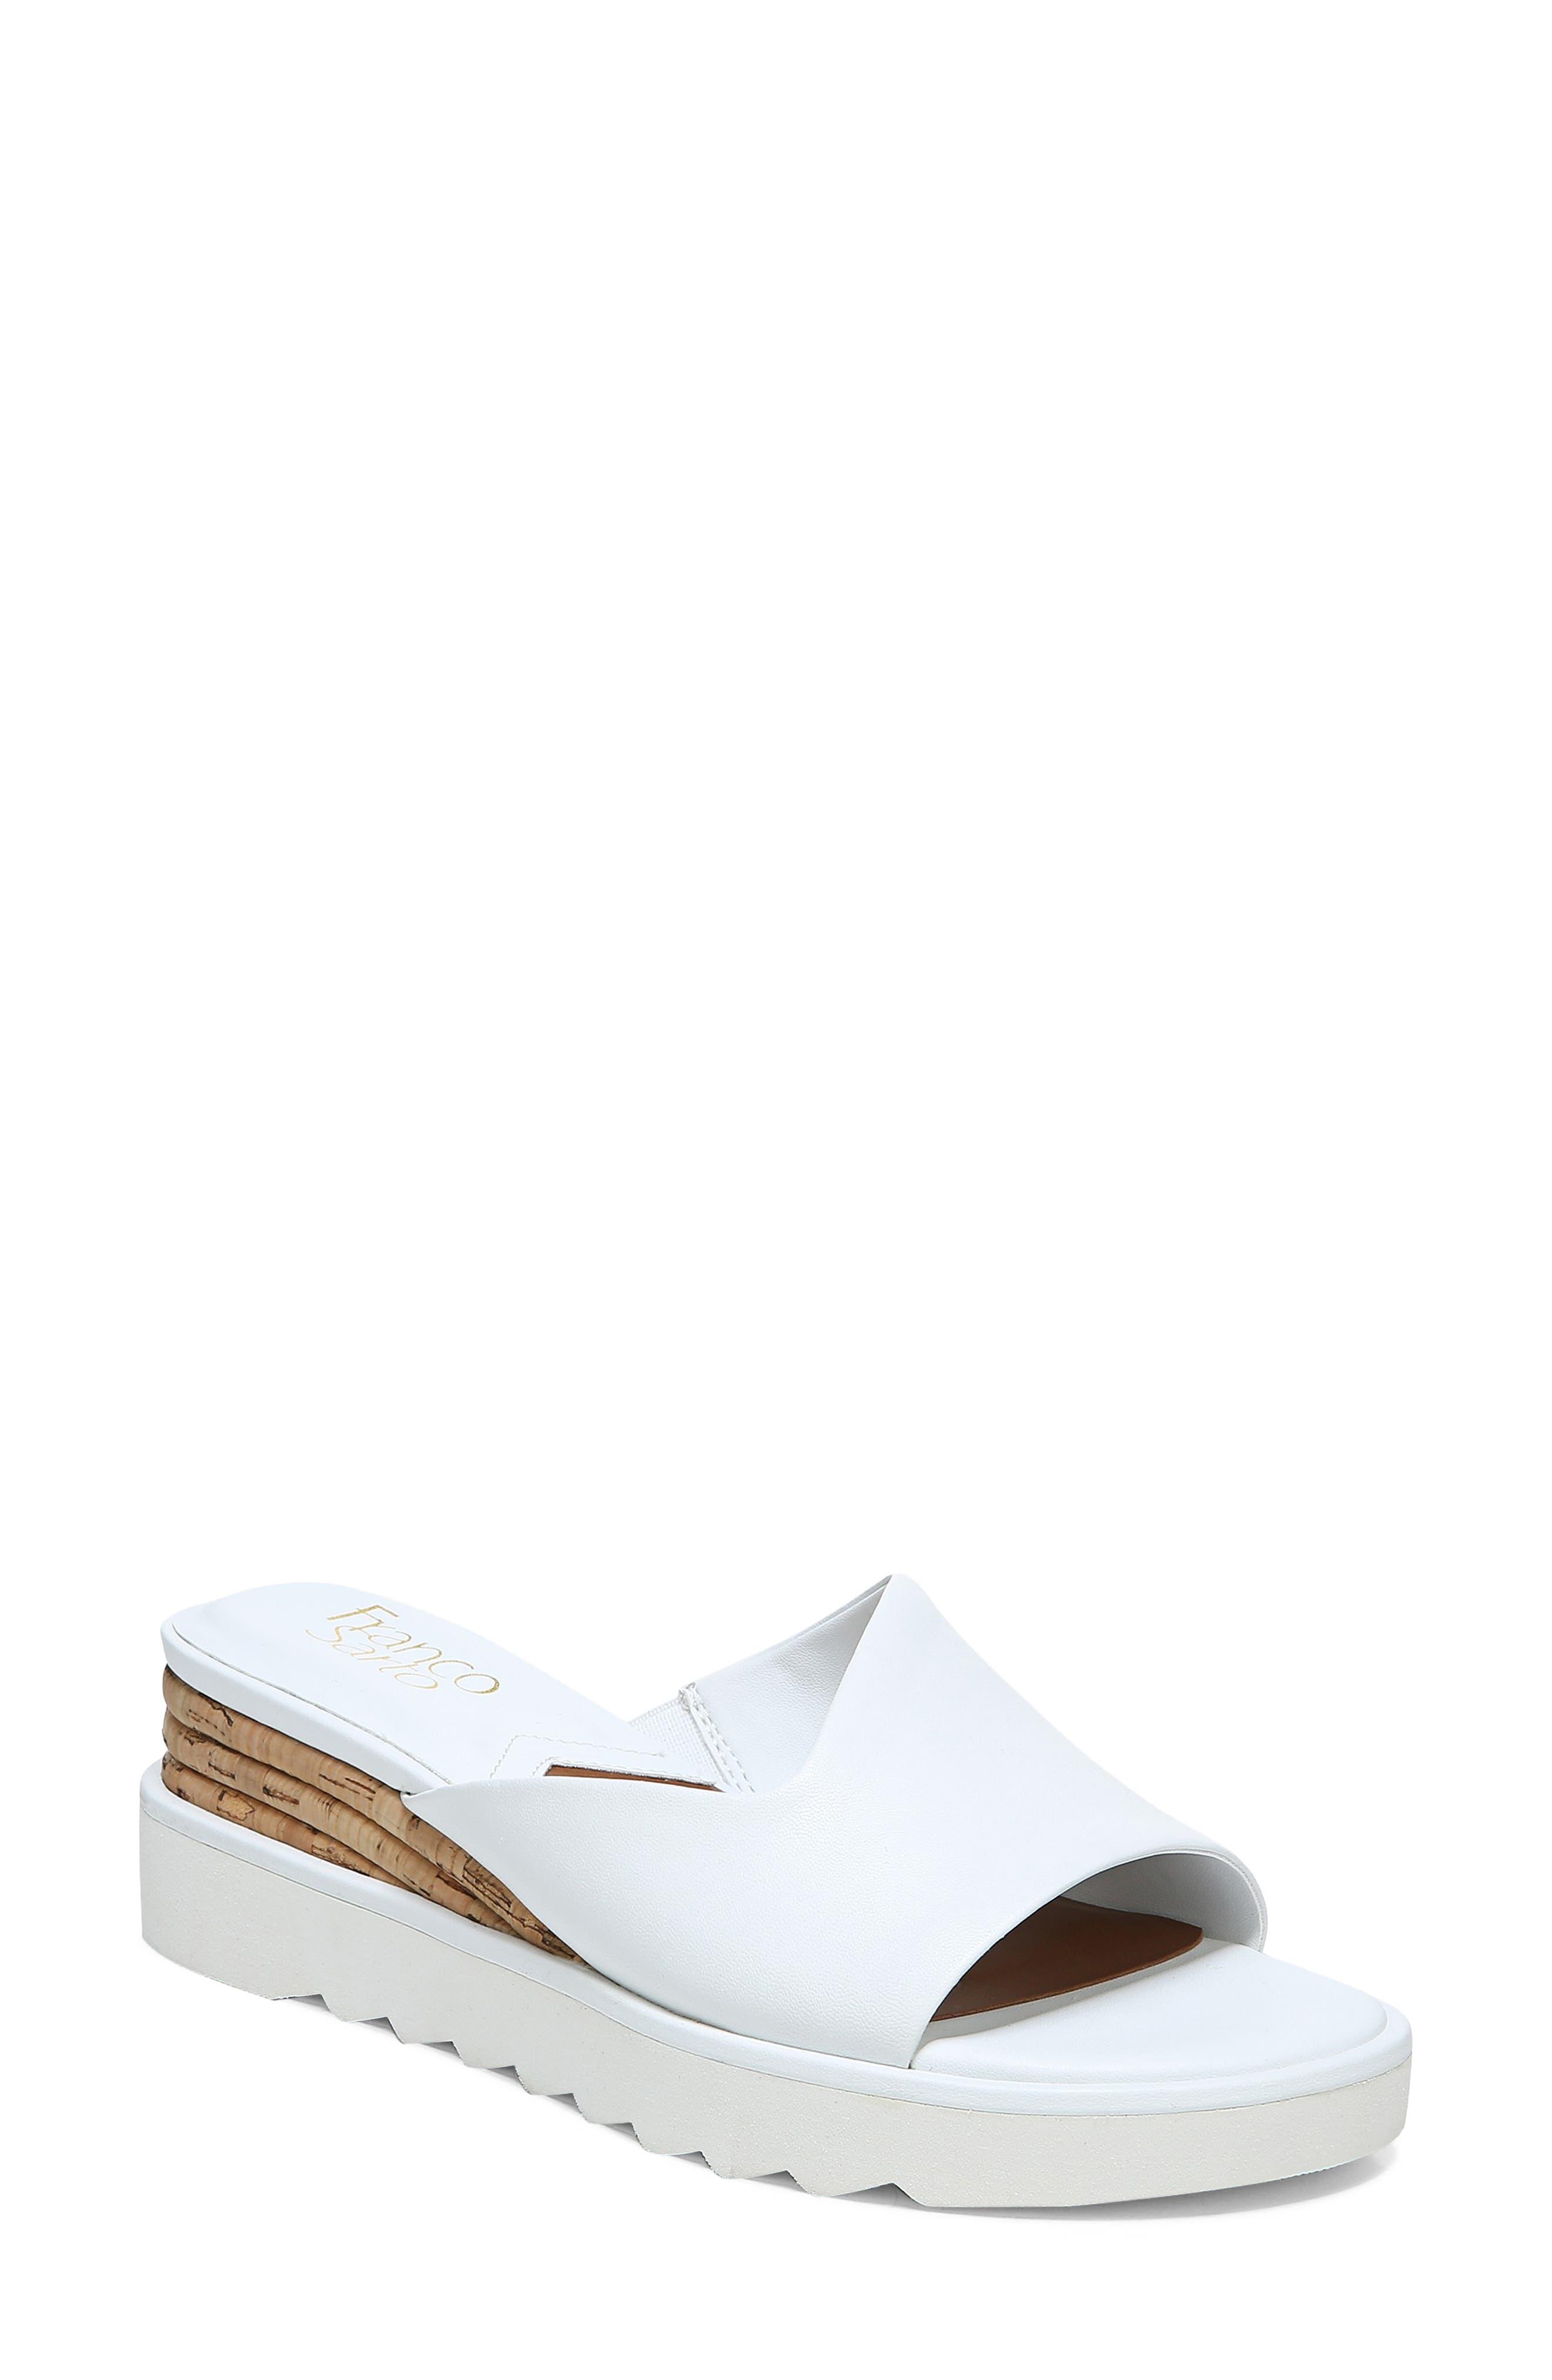 Chazz Slide Sandal